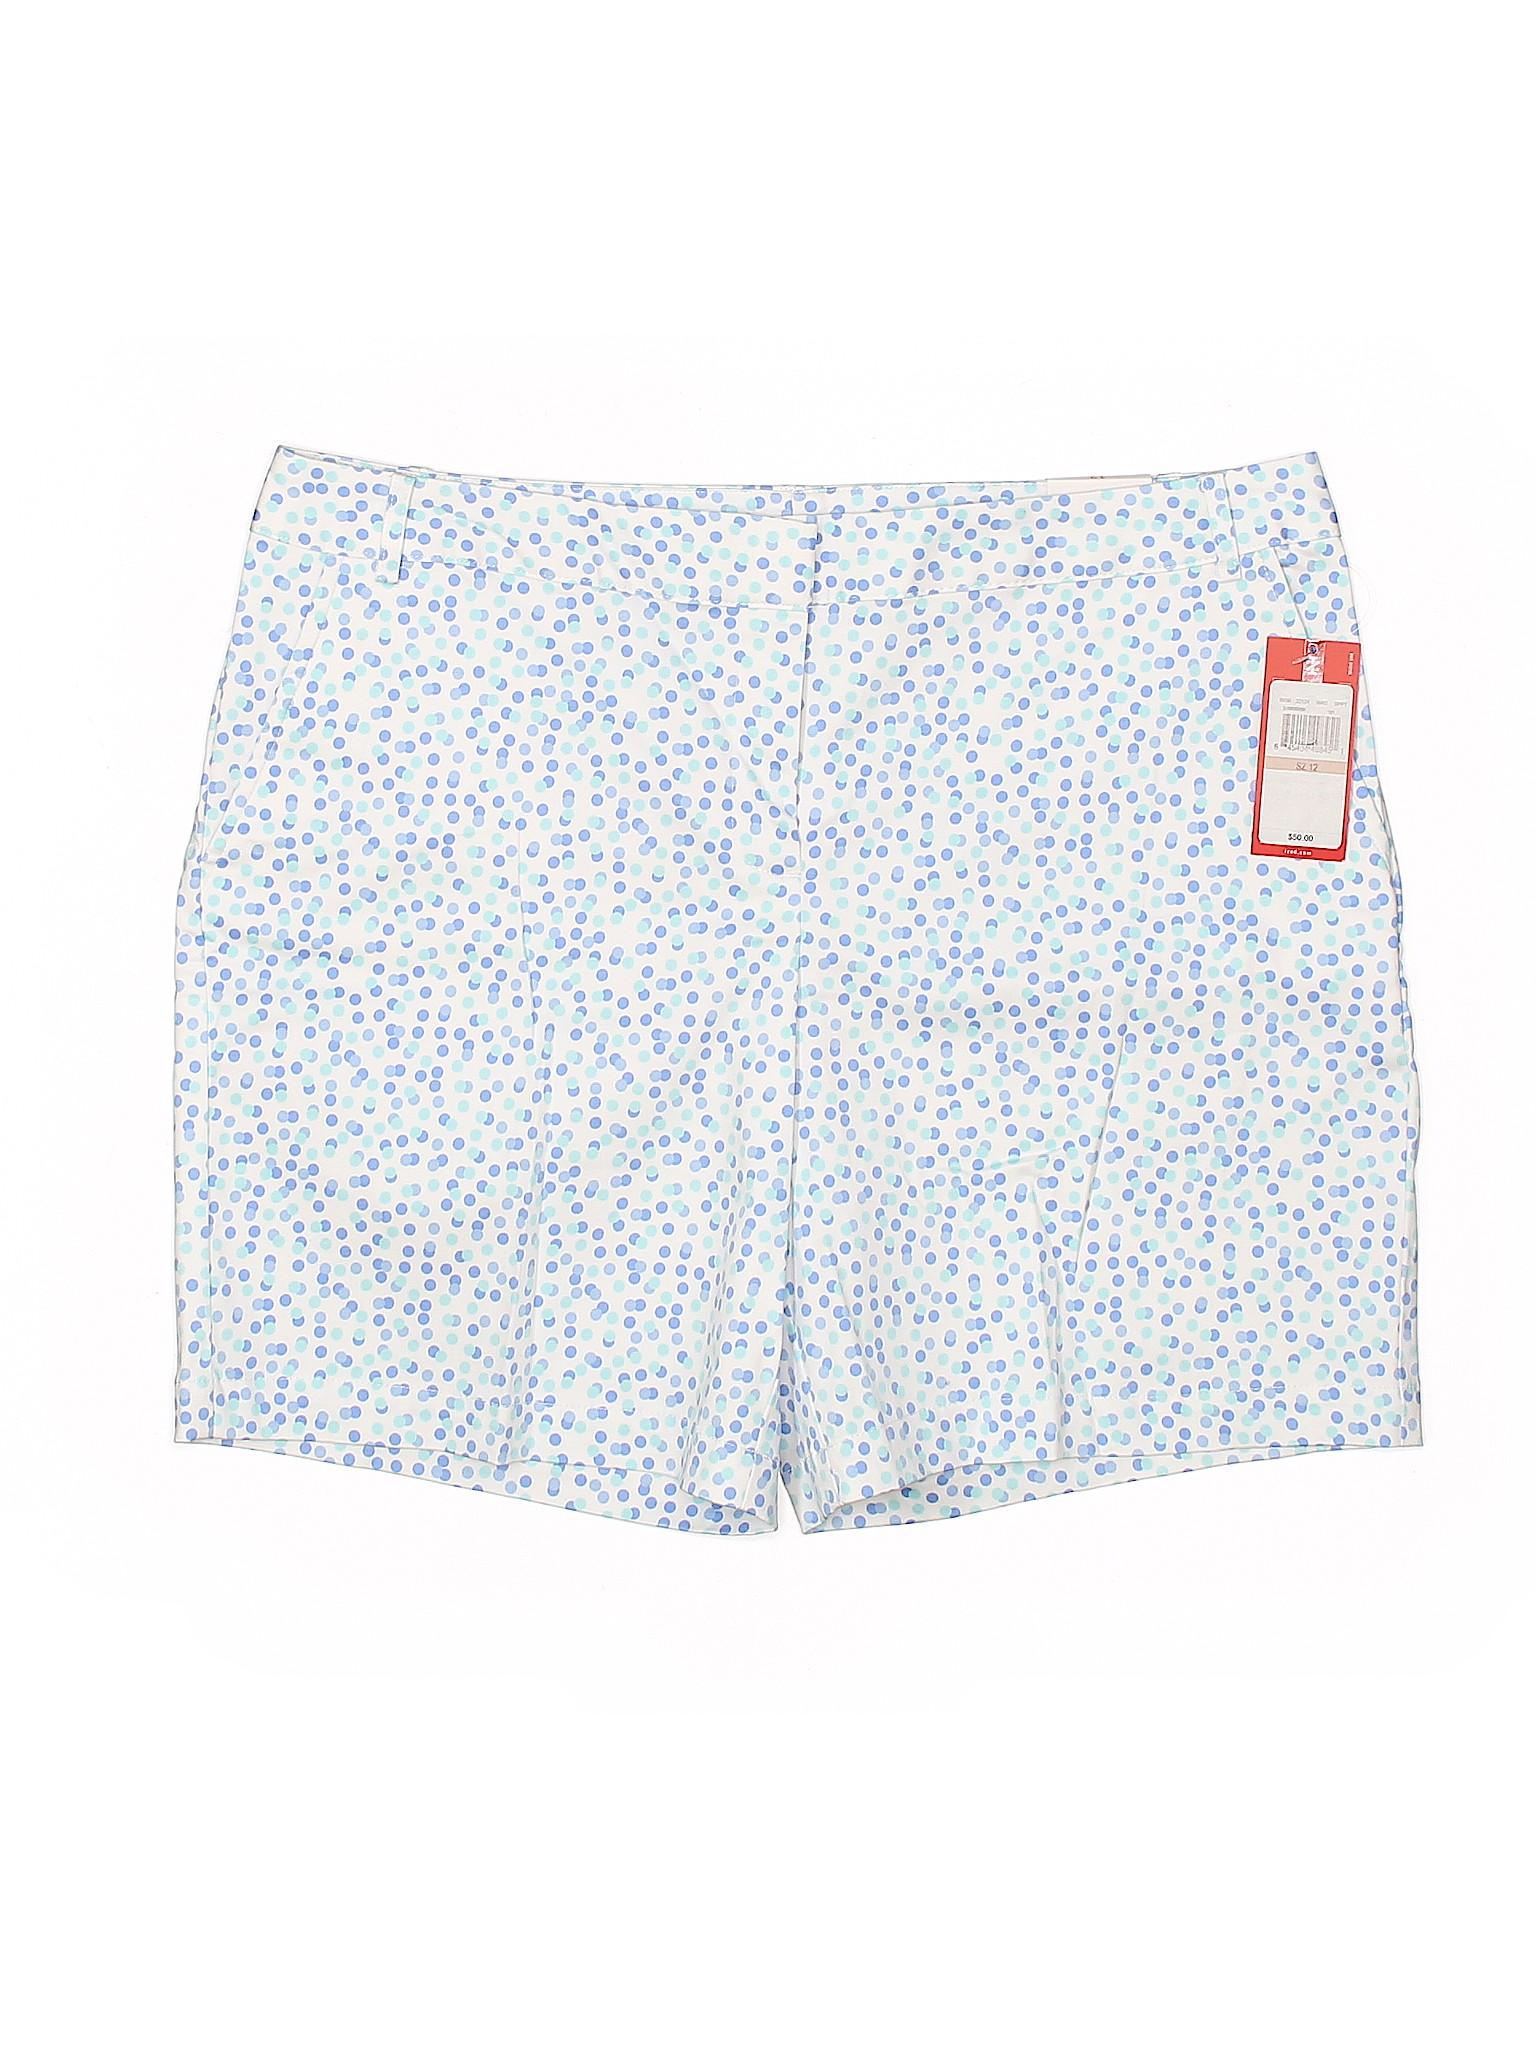 Boutique IZOD Shorts Shorts Boutique Khaki Khaki Khaki IZOD Shorts IZOD Boutique Boutique IZOD YIYqp